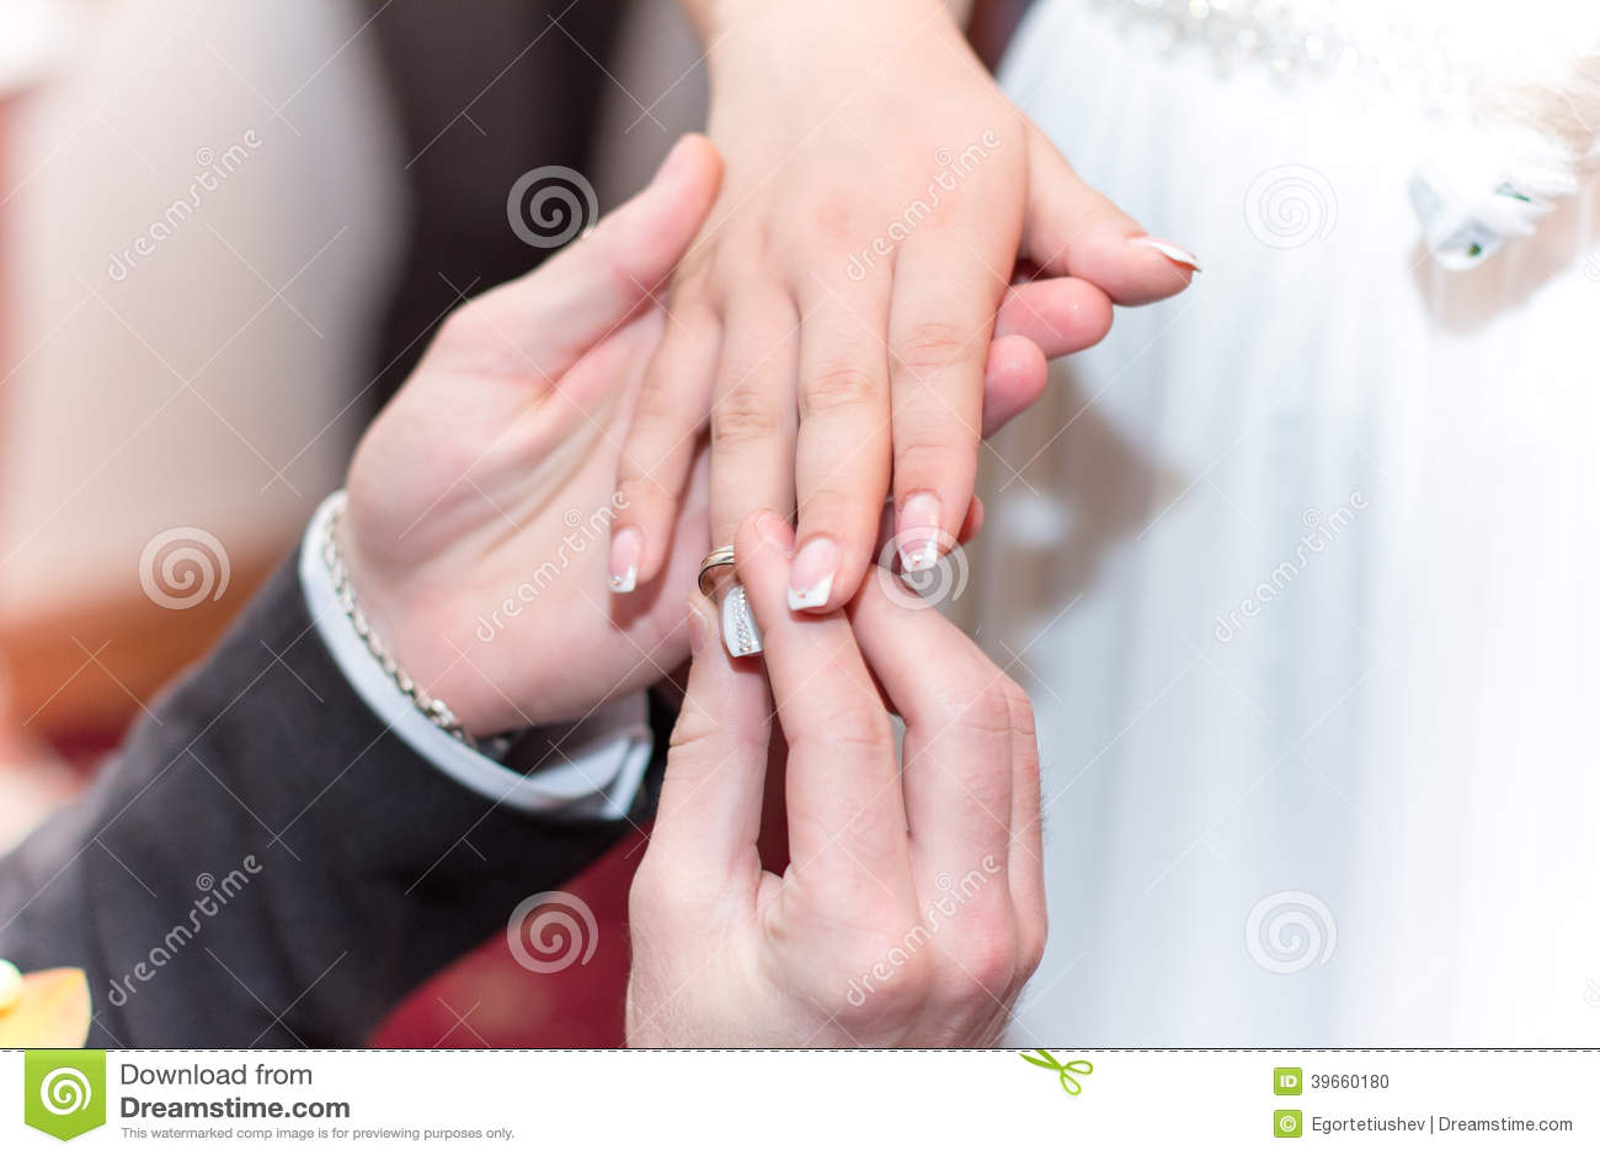 Wedding Ceremony stock photo. Image of finger, marry - 39660180